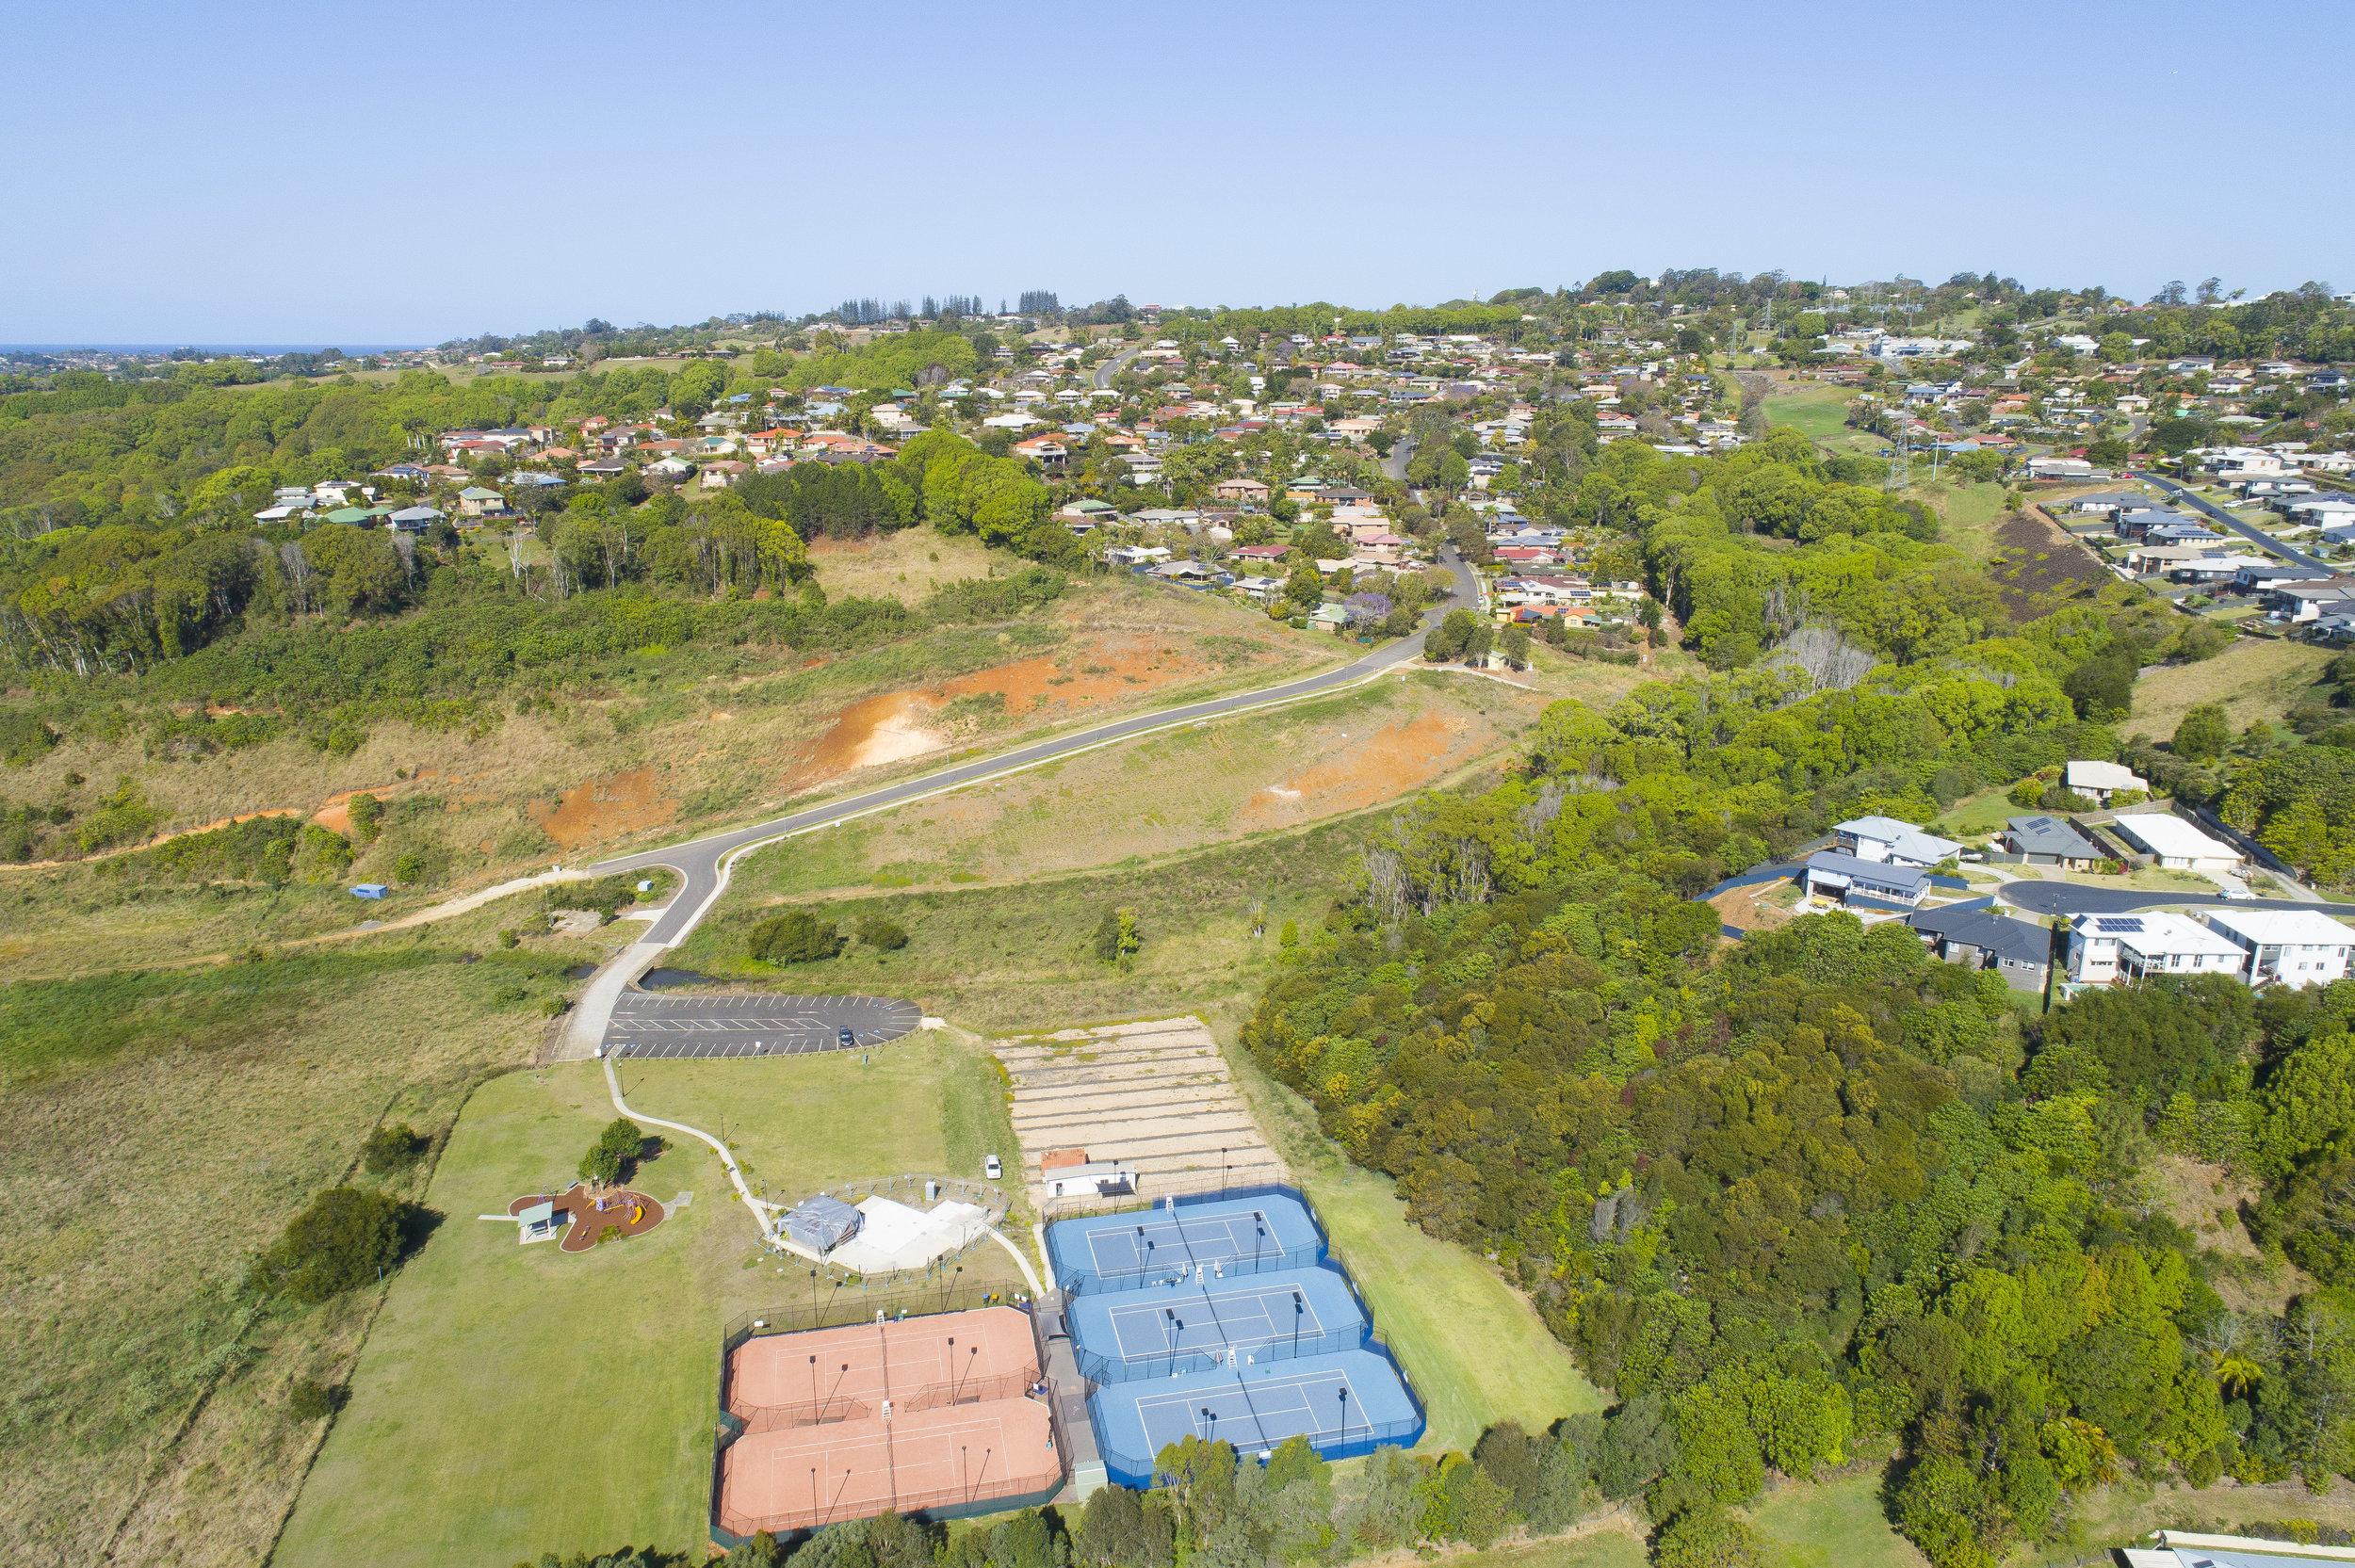 Aerial Hotshots_Henry lawson Drive Terranora_09192018010.jpg